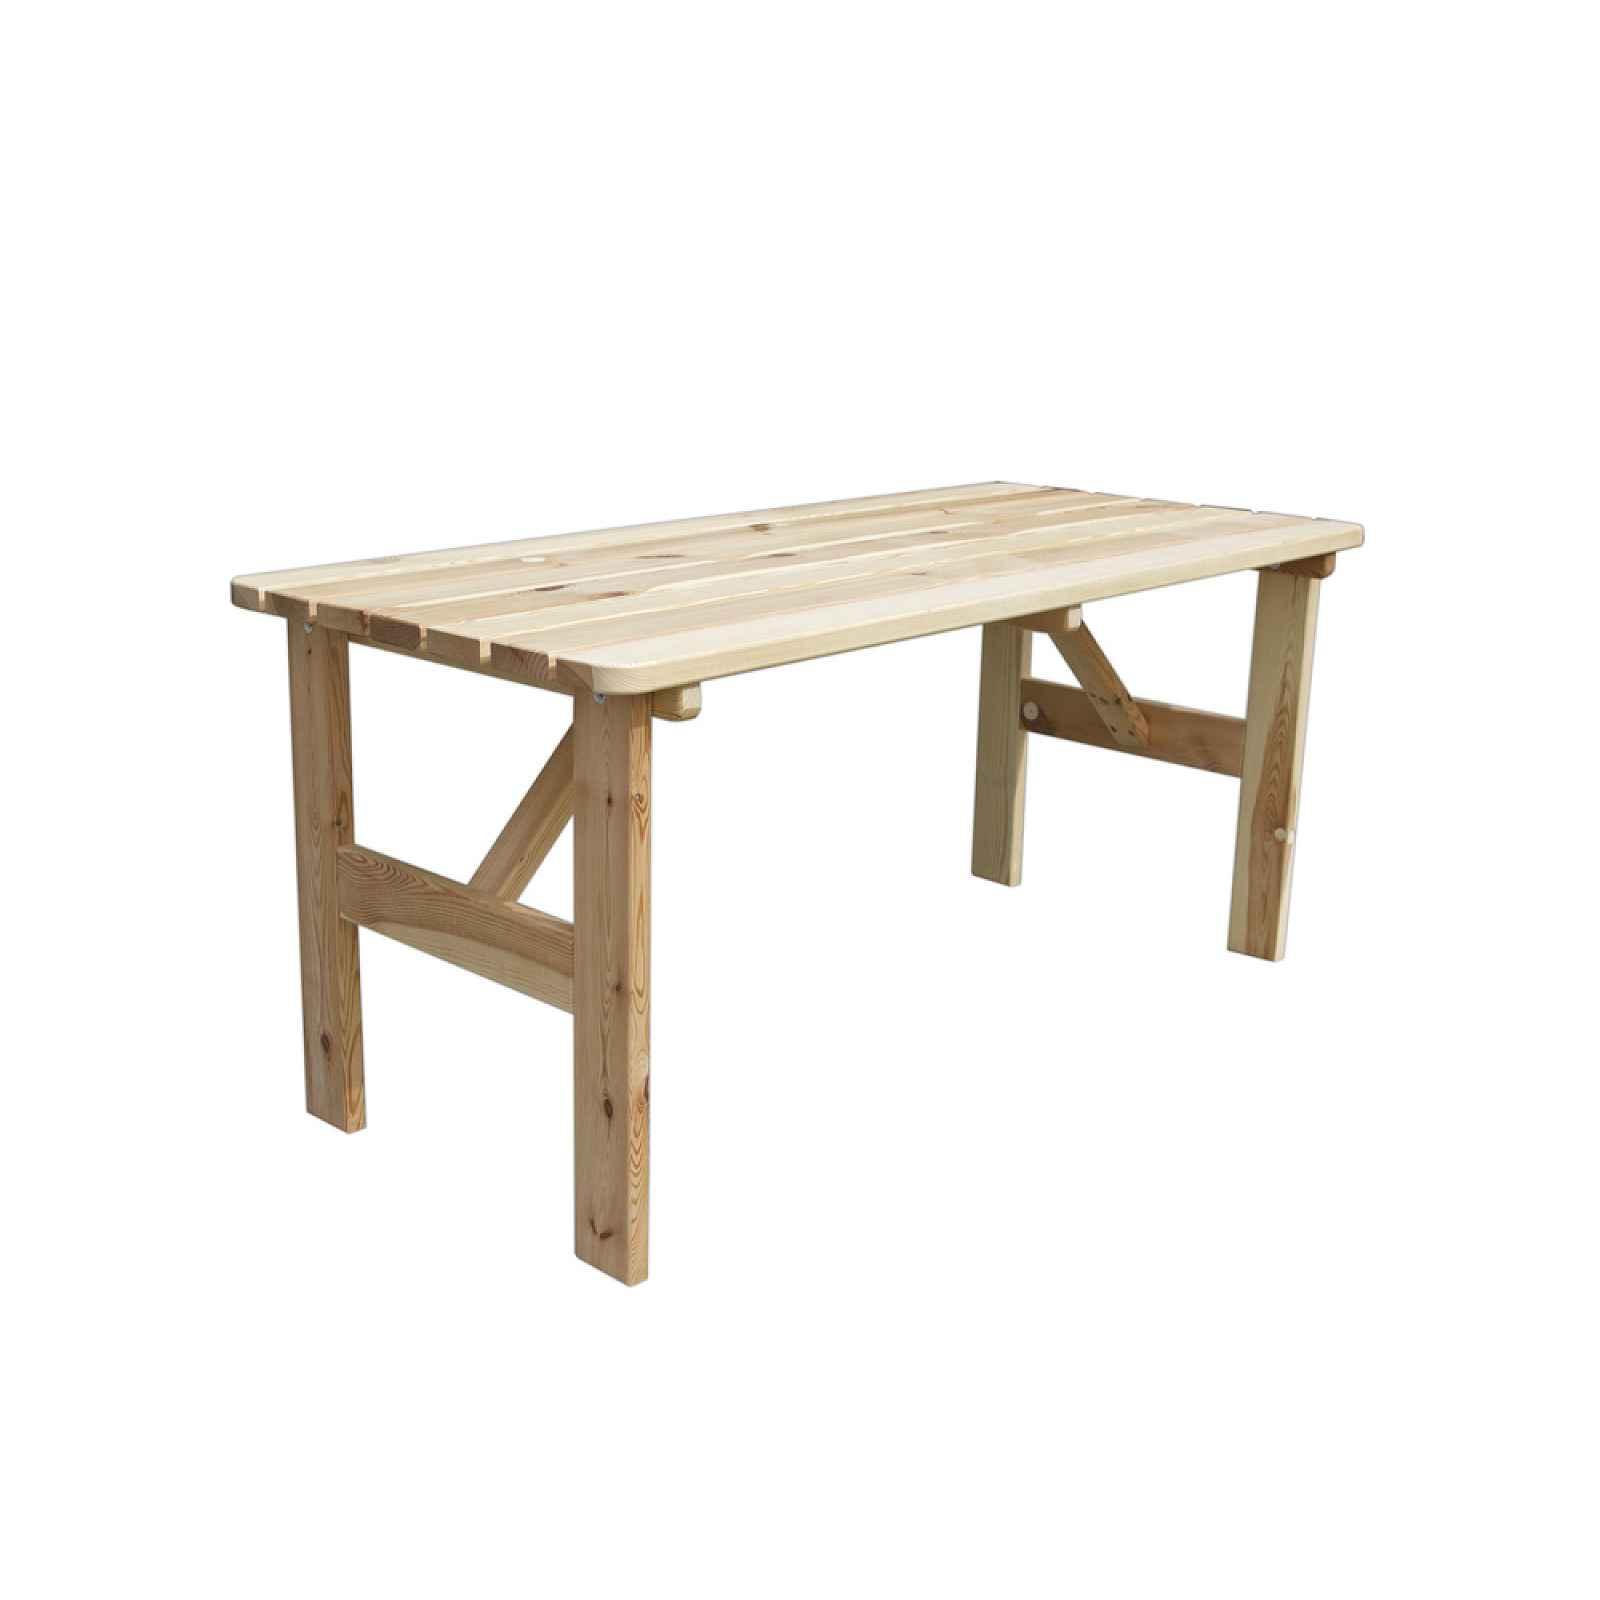 VIKING stůl - ROJAPLAST 180x70 cm